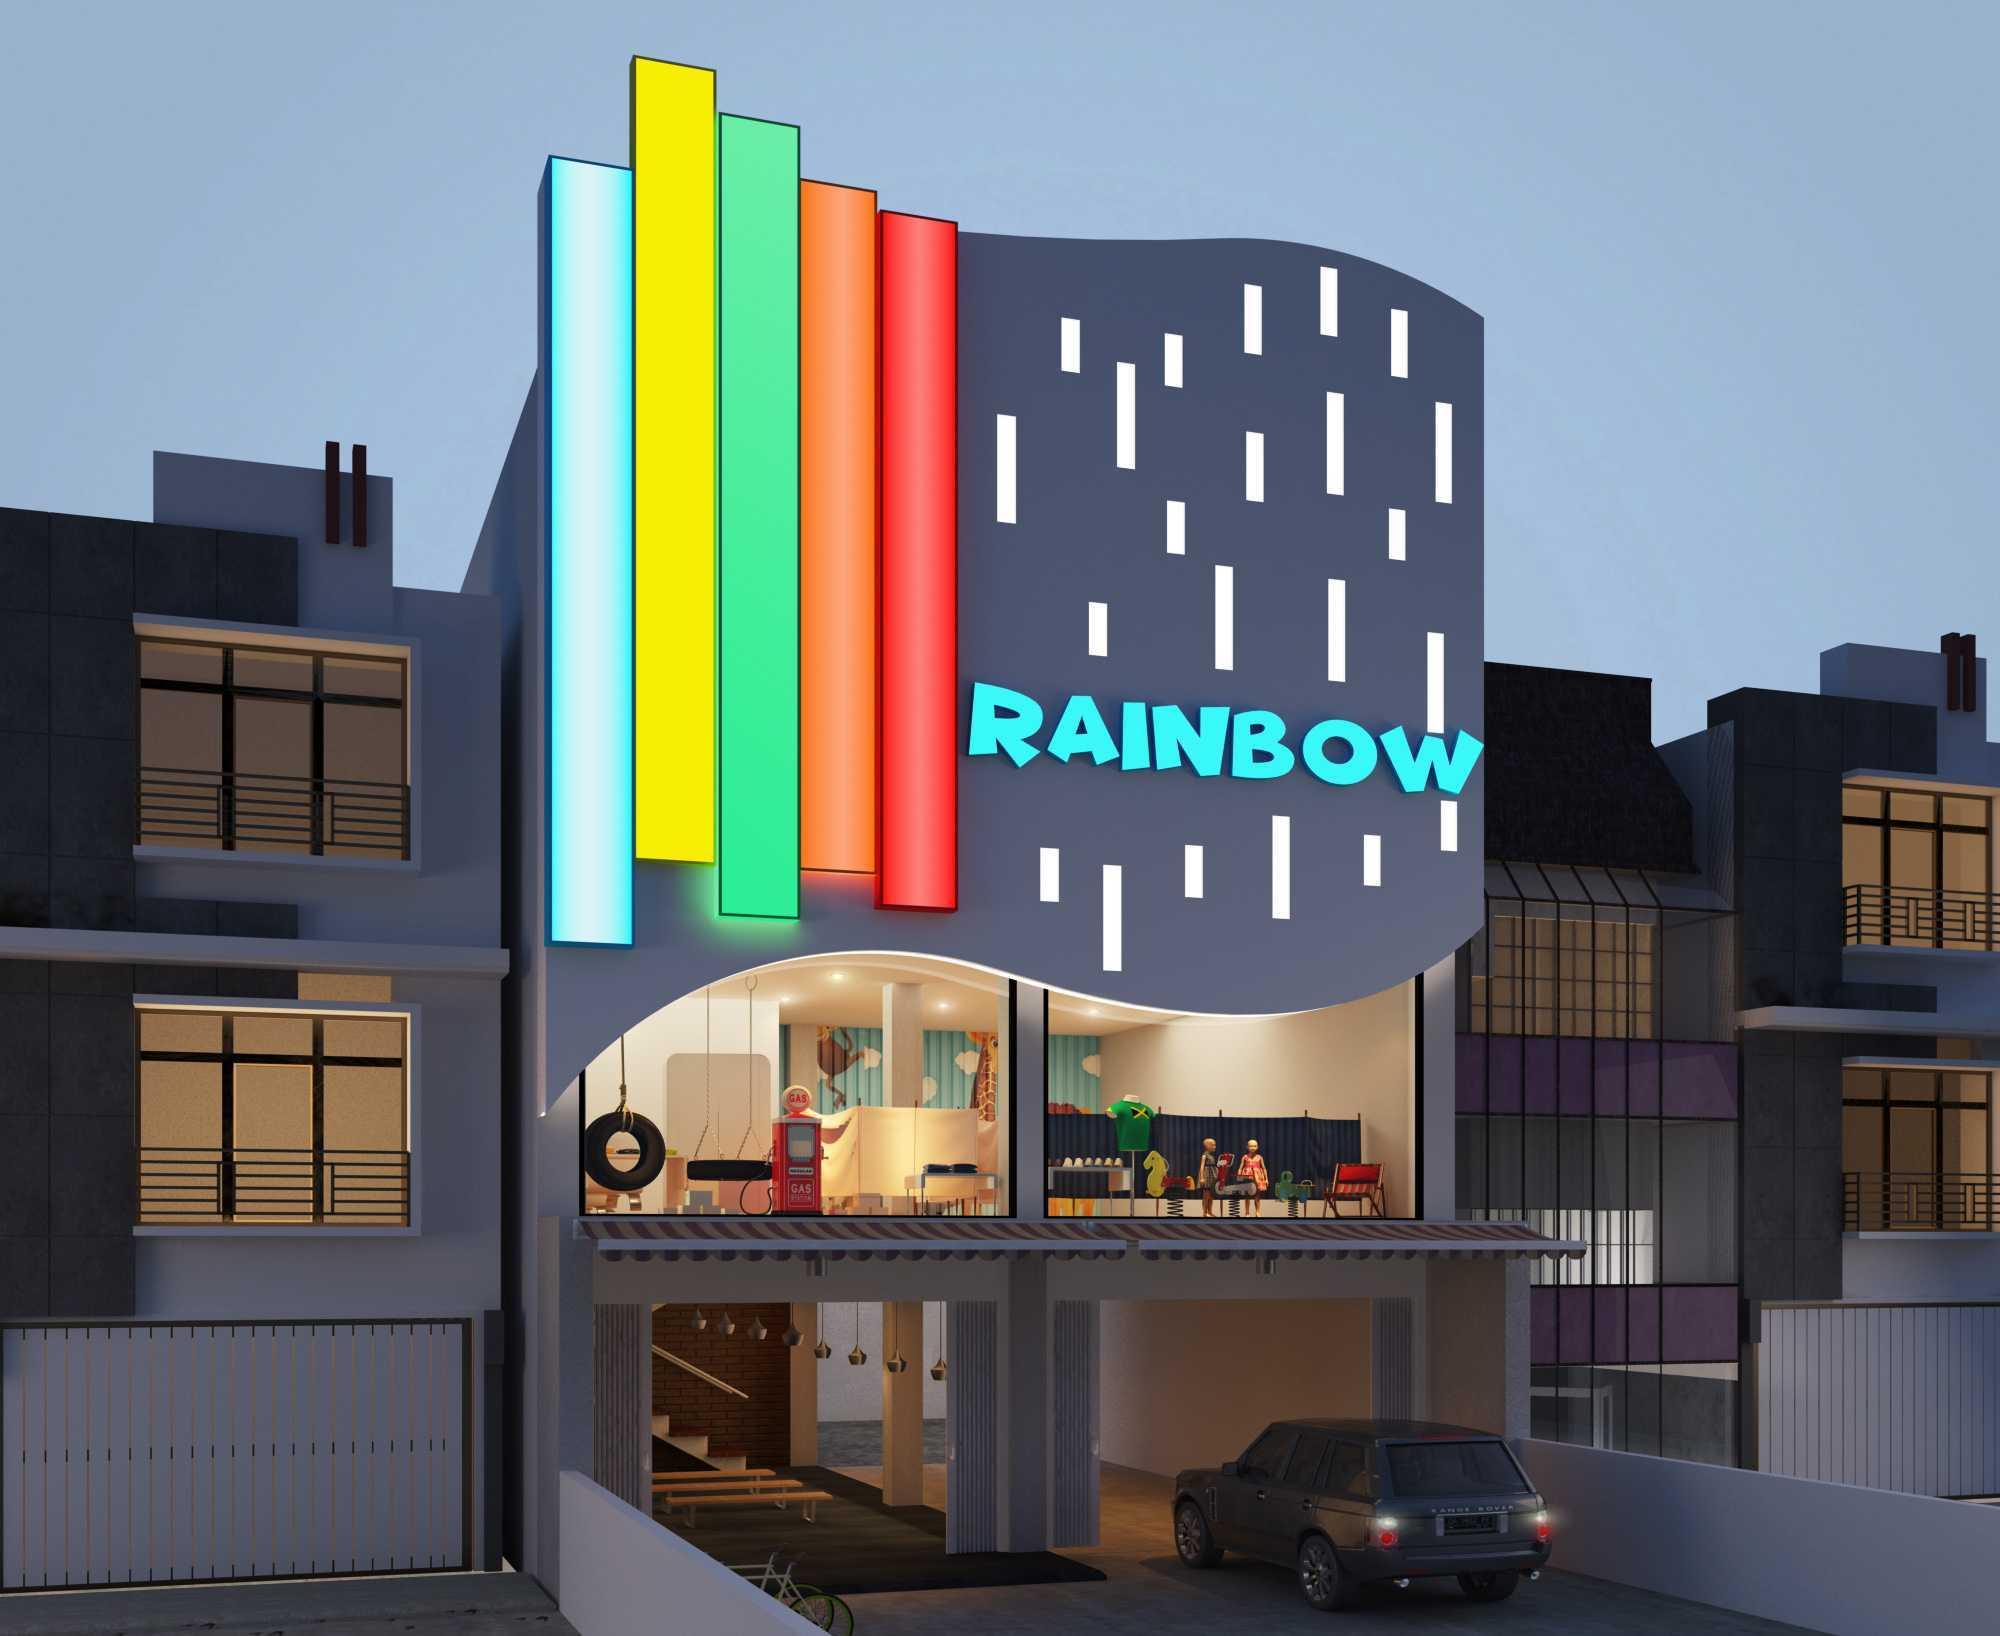 Acia Interior Baby And Kids Store Rainbow Banjarmasin, Kota Banjarmasin, Kalimantan Selatan, Indonesia Banjarmasin, Kota Banjarmasin, Kalimantan Selatan, Indonesia Acia-Interior-Baby-And-Kids-Store-Rainbow  63069